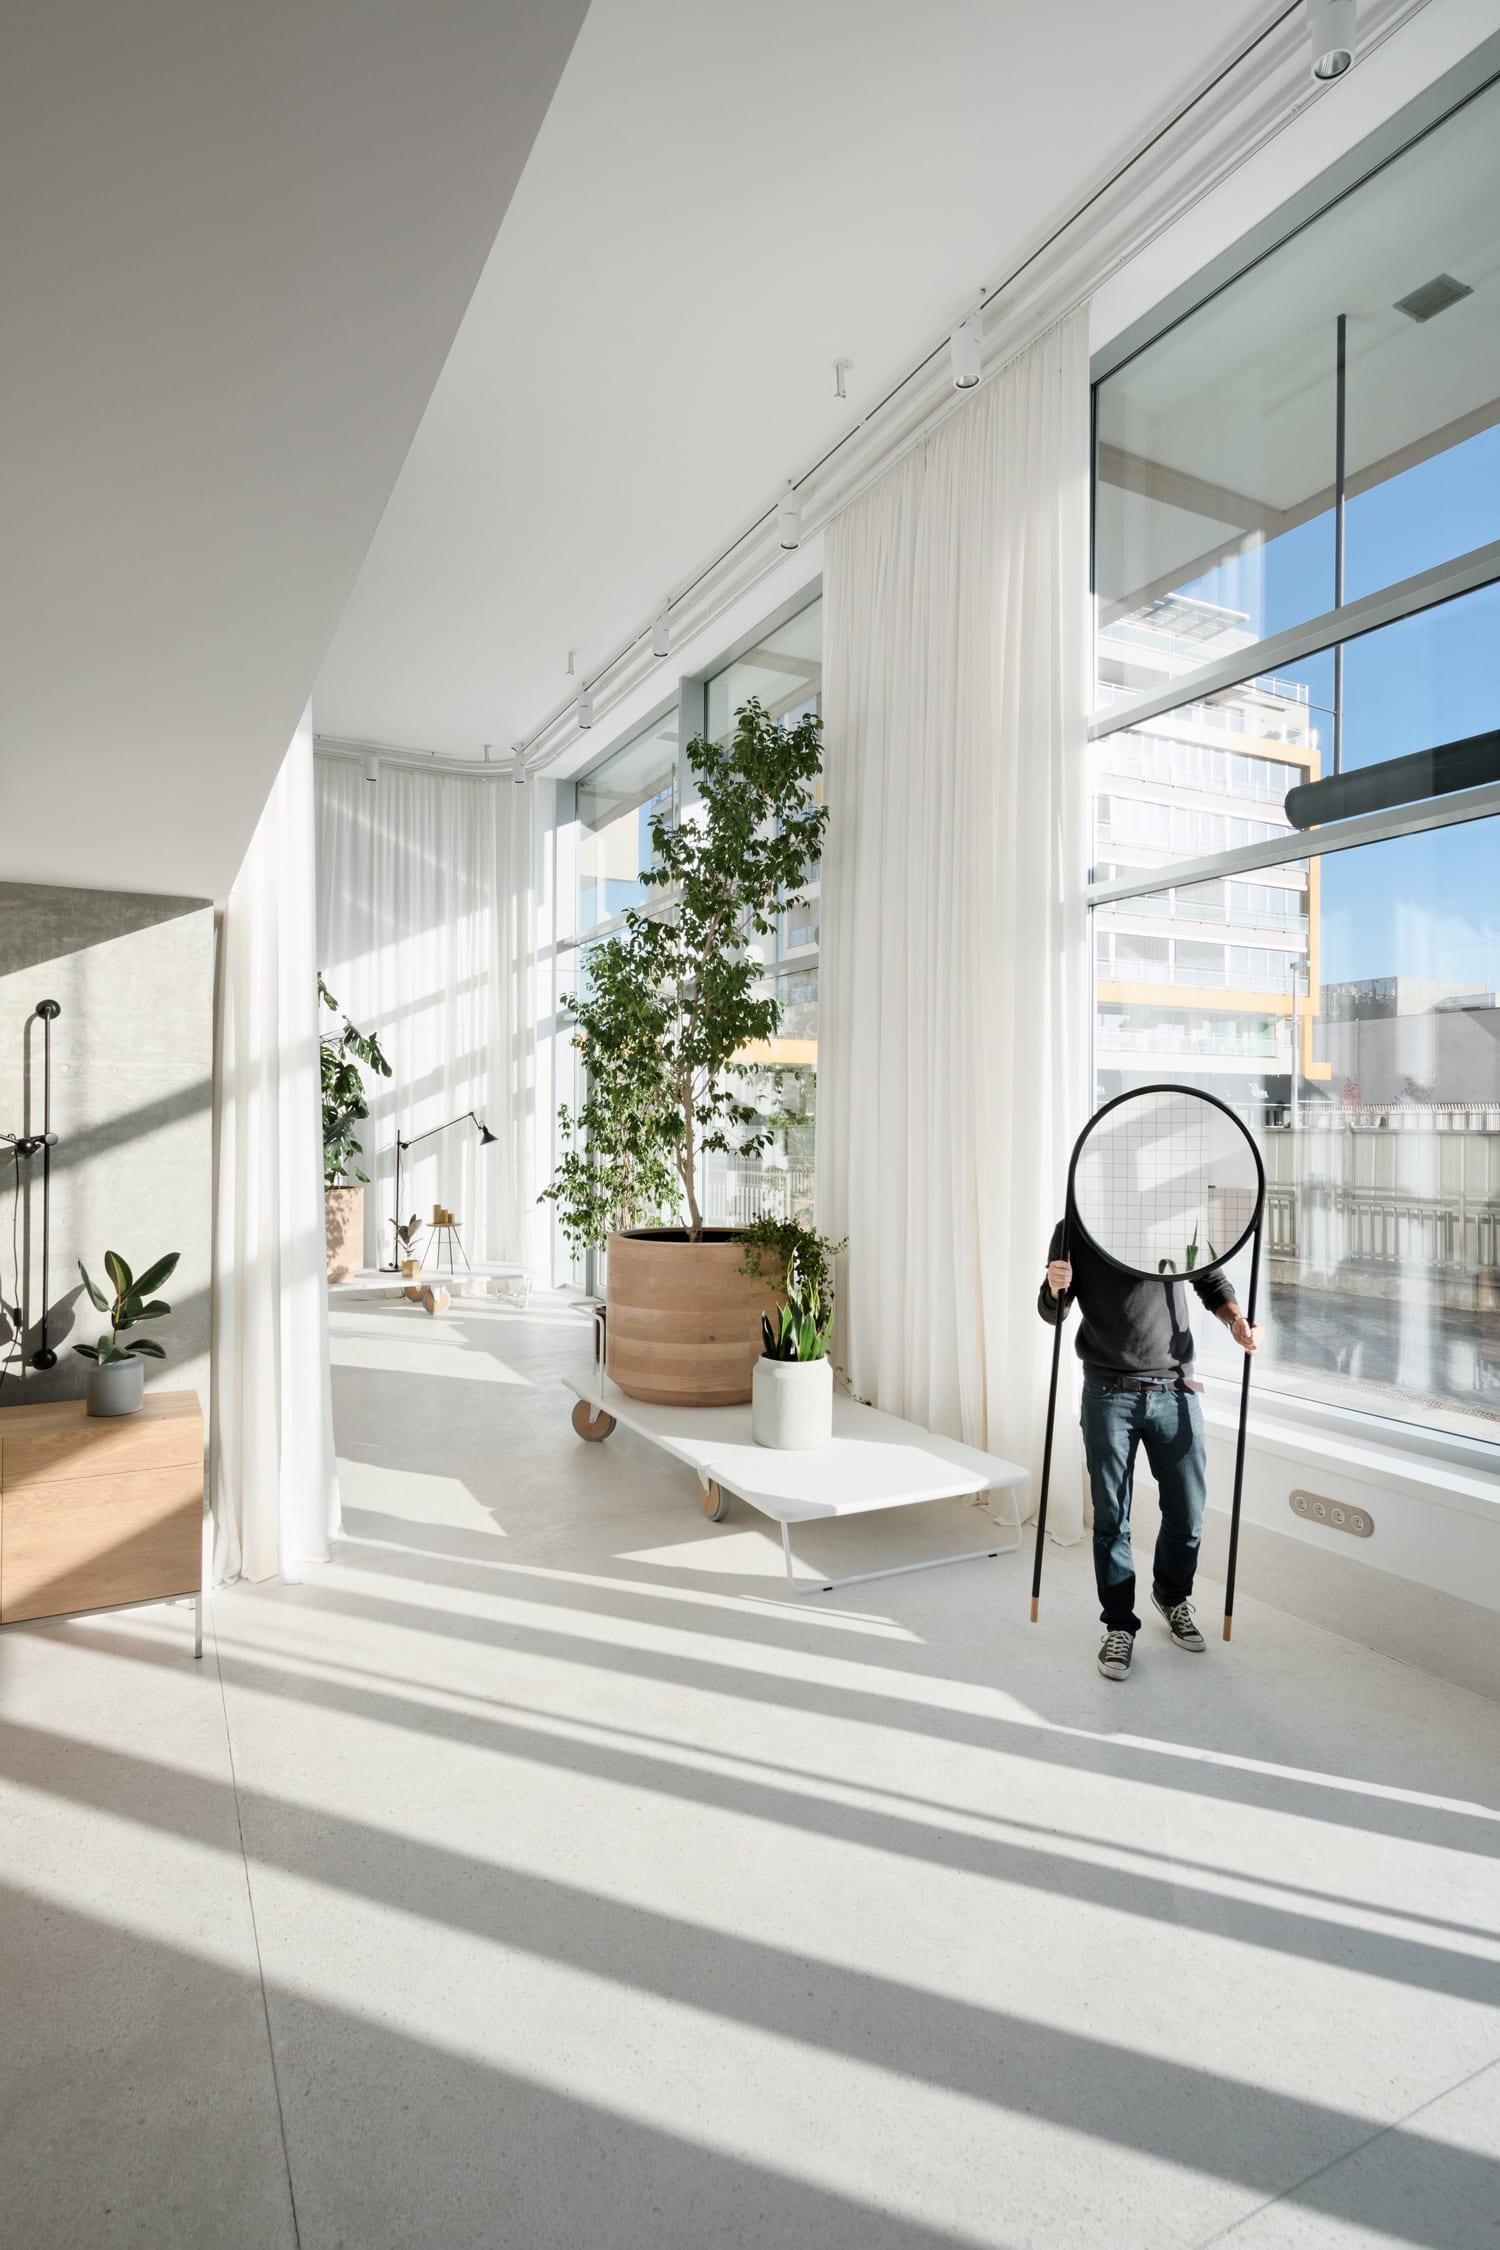 Gir Design Showroom in New Belgrade, Serbia by Studio AUTORI | Yellowtrace